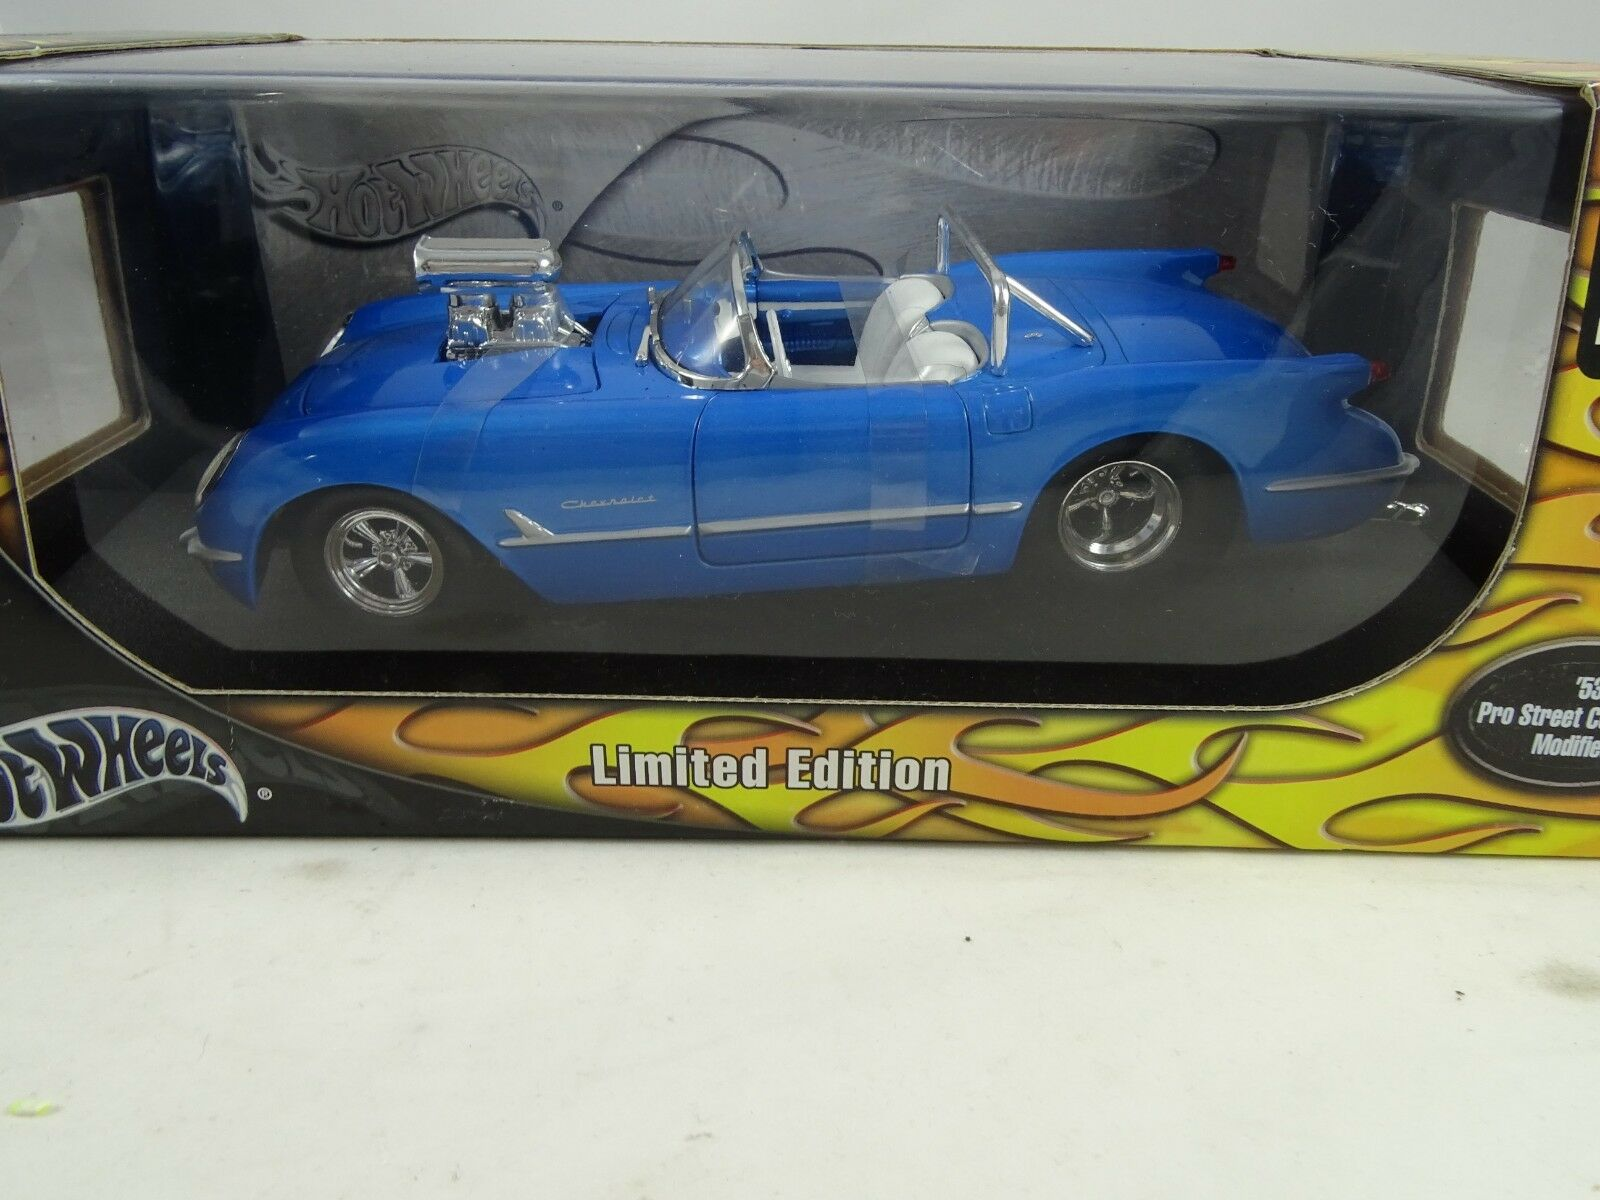 1 18 Hot Wheels  B6067 - 1953 Pro Street Street Street Corvette Blau  -  RARITÄT § fb03a0